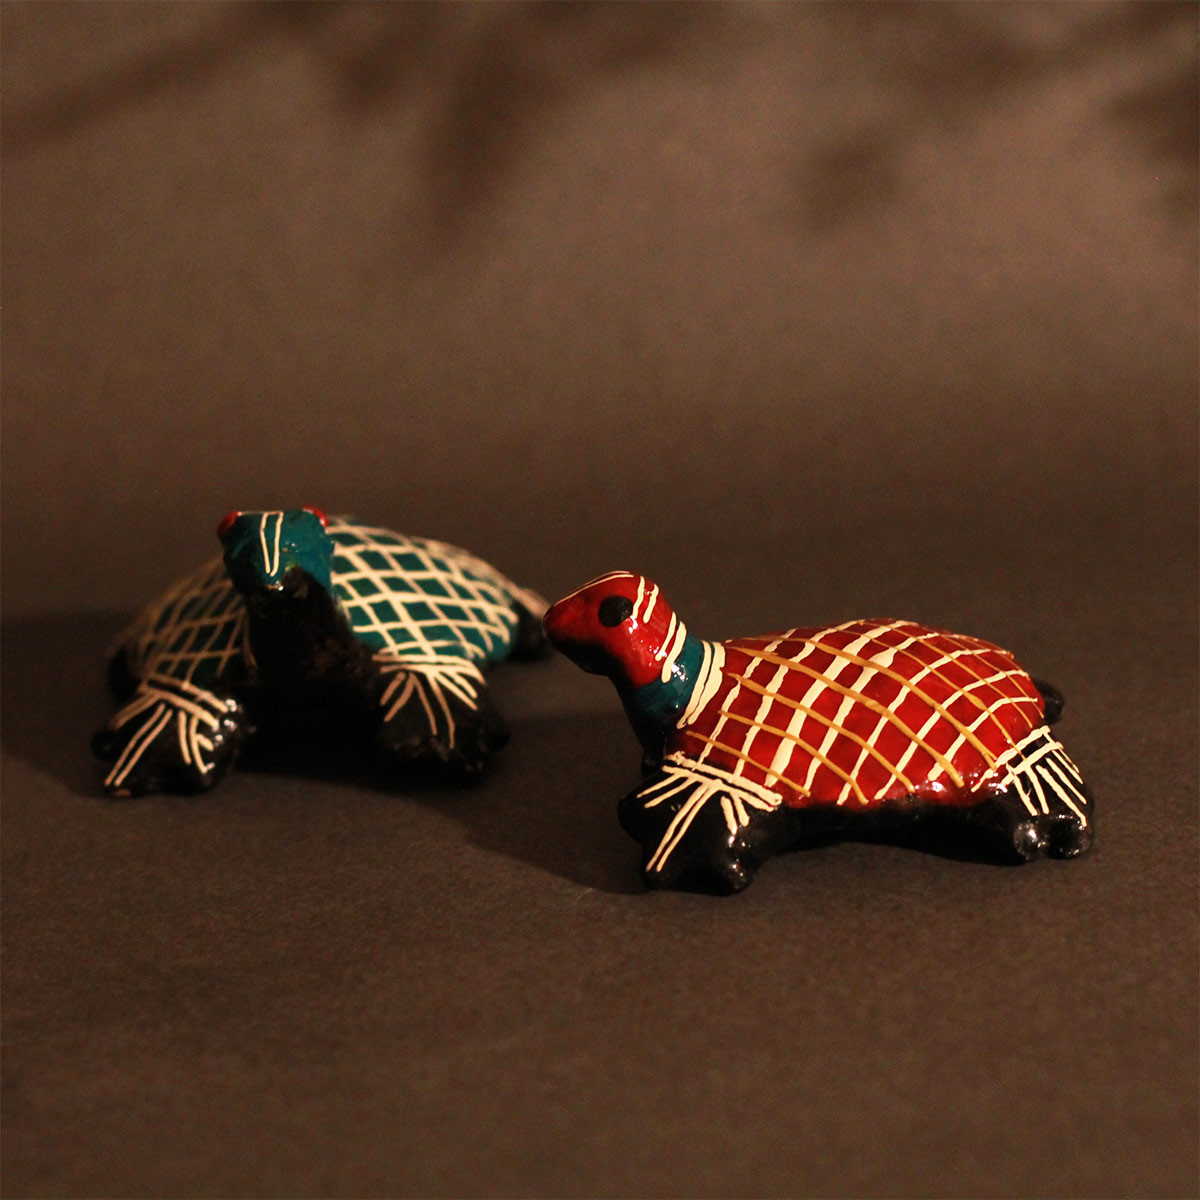 Galar Putul / Shellac Dolls- Set of 2 Tortoise figures